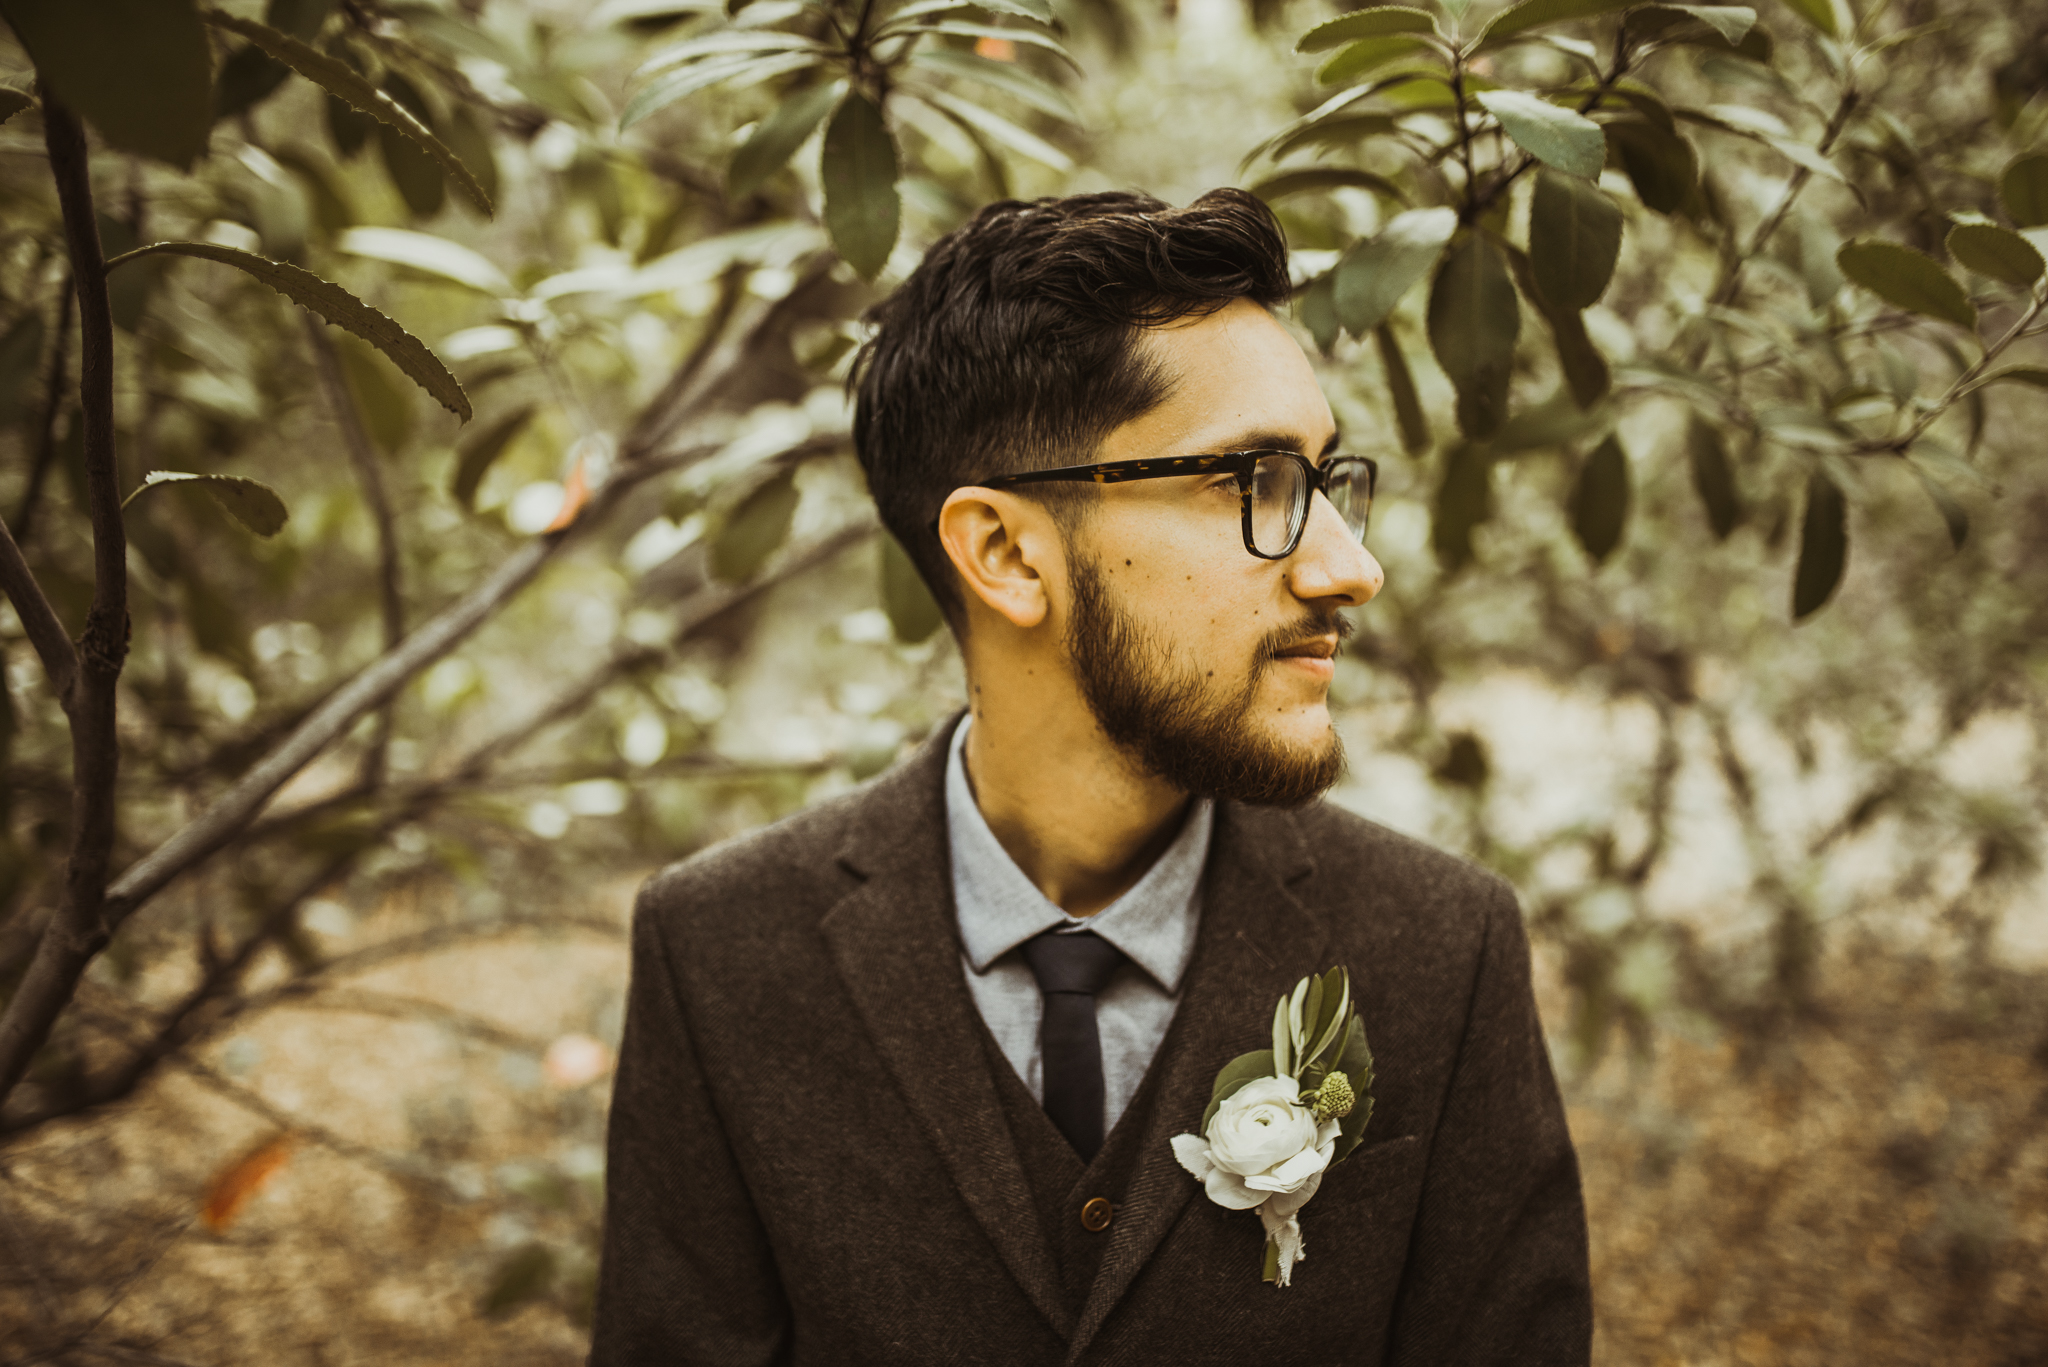 ©Isaiah-&-Taylor-Photography---Oak-Canyon-Nature-Center-Wedding,-Anaheim-Hills-005.jpg